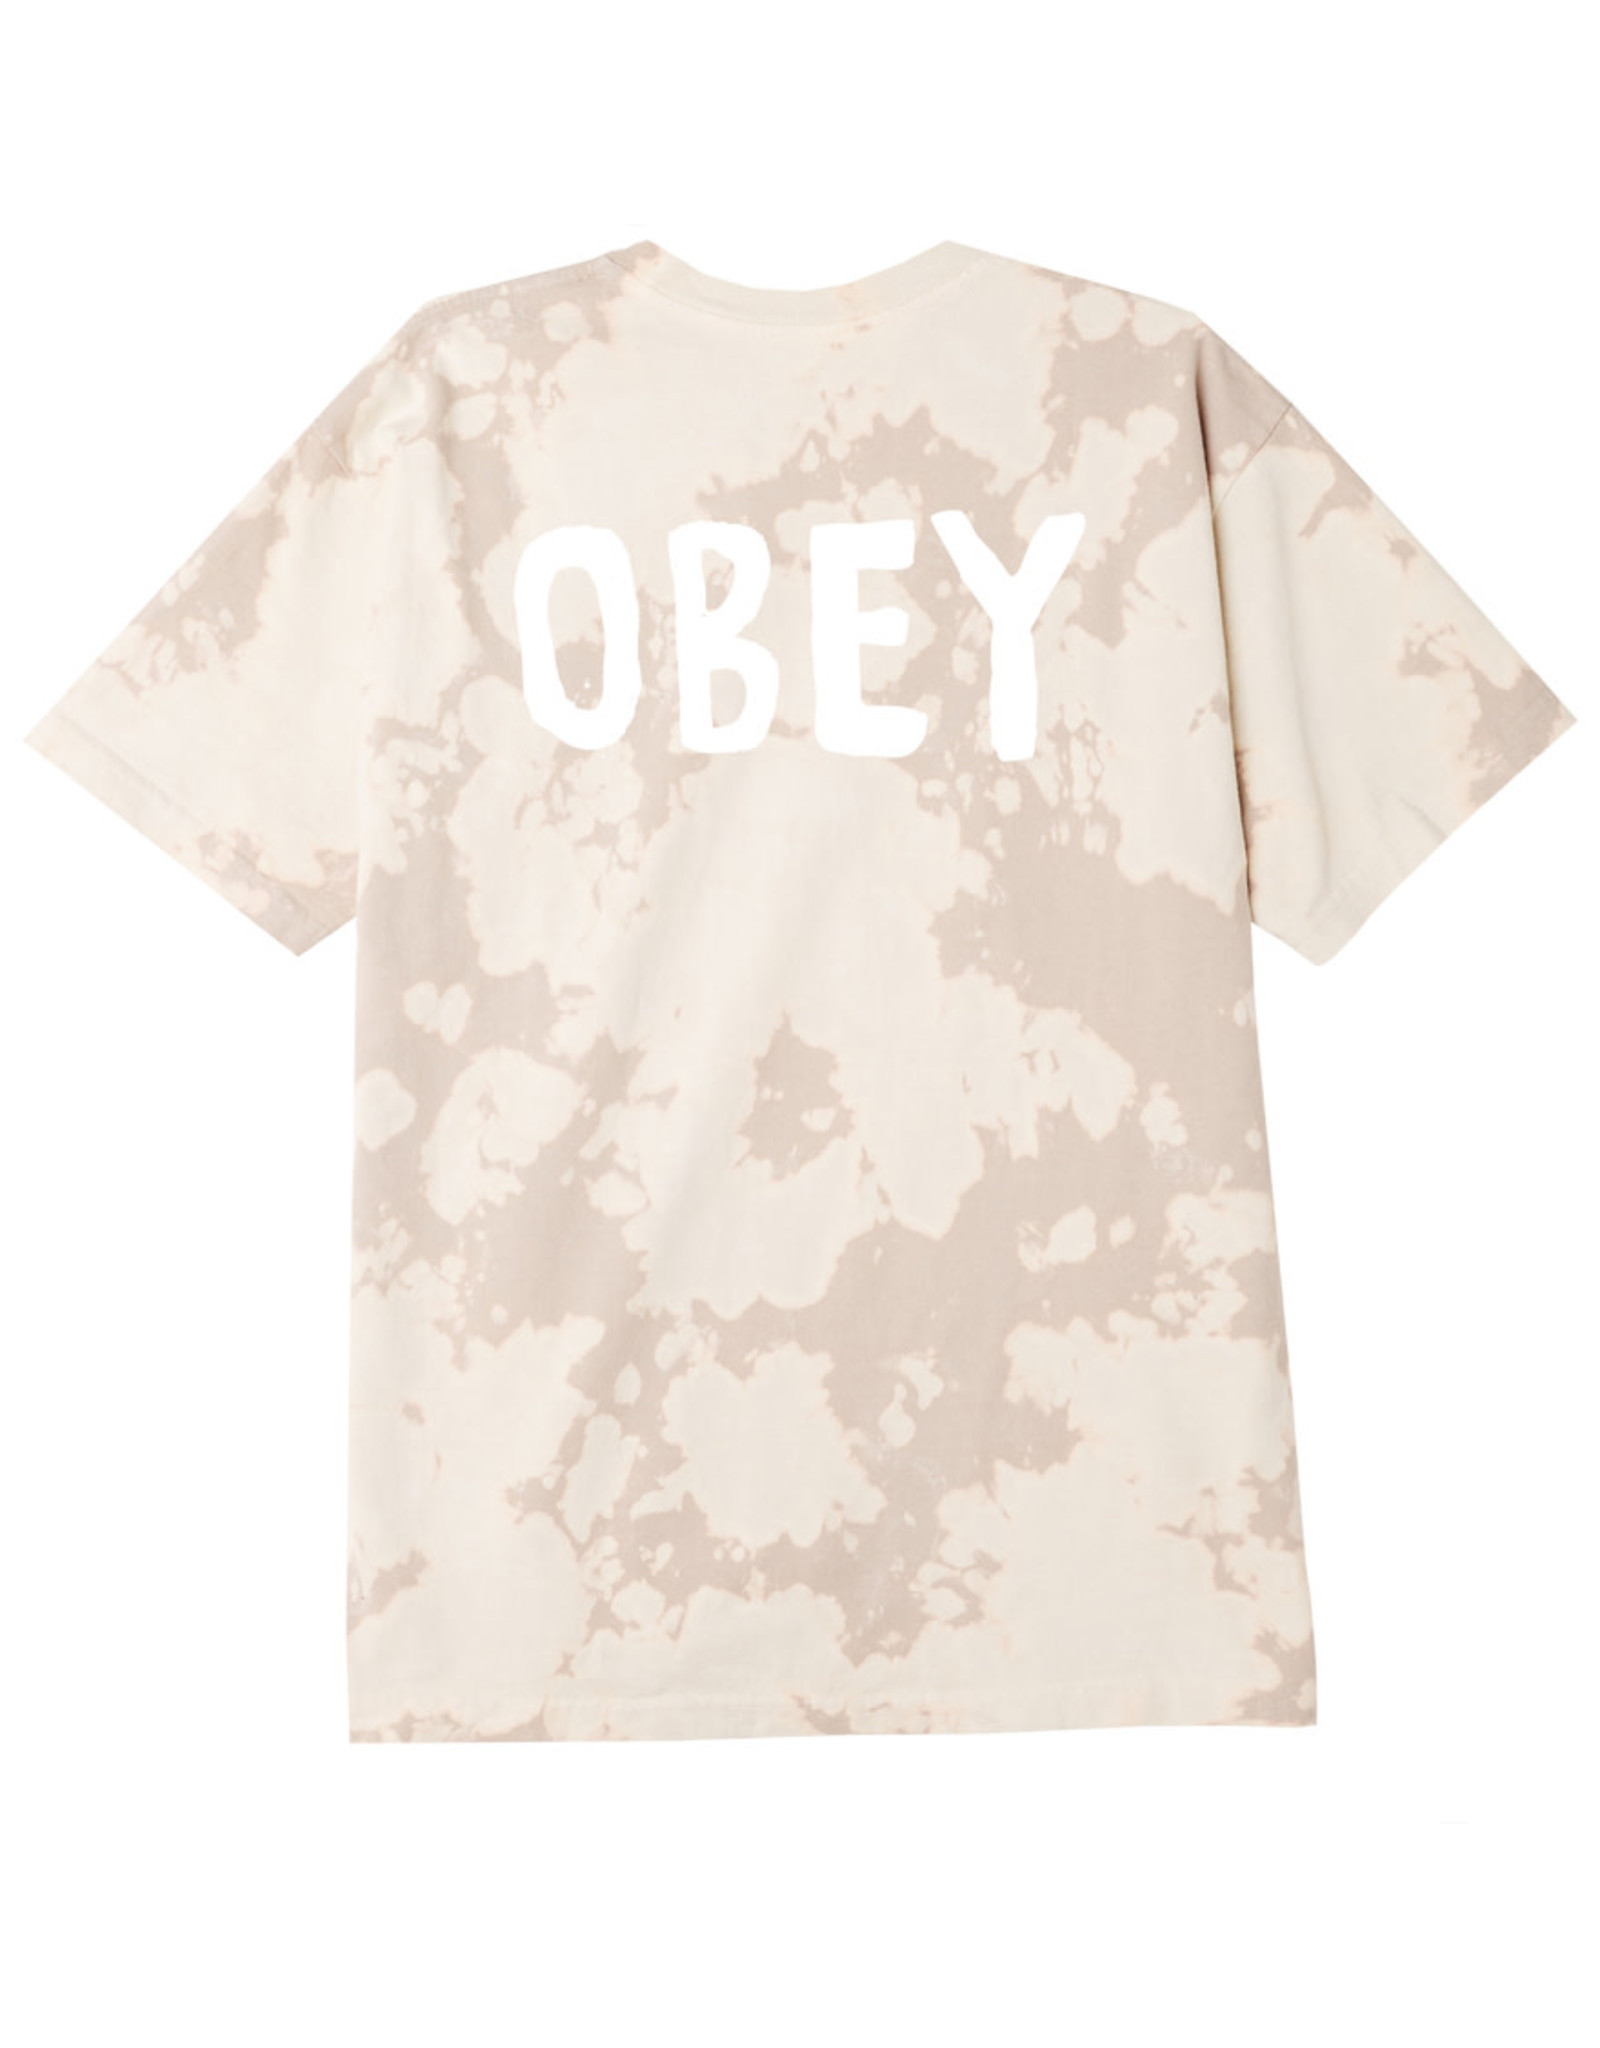 Obey Obey - T-shirt homme obey og humus